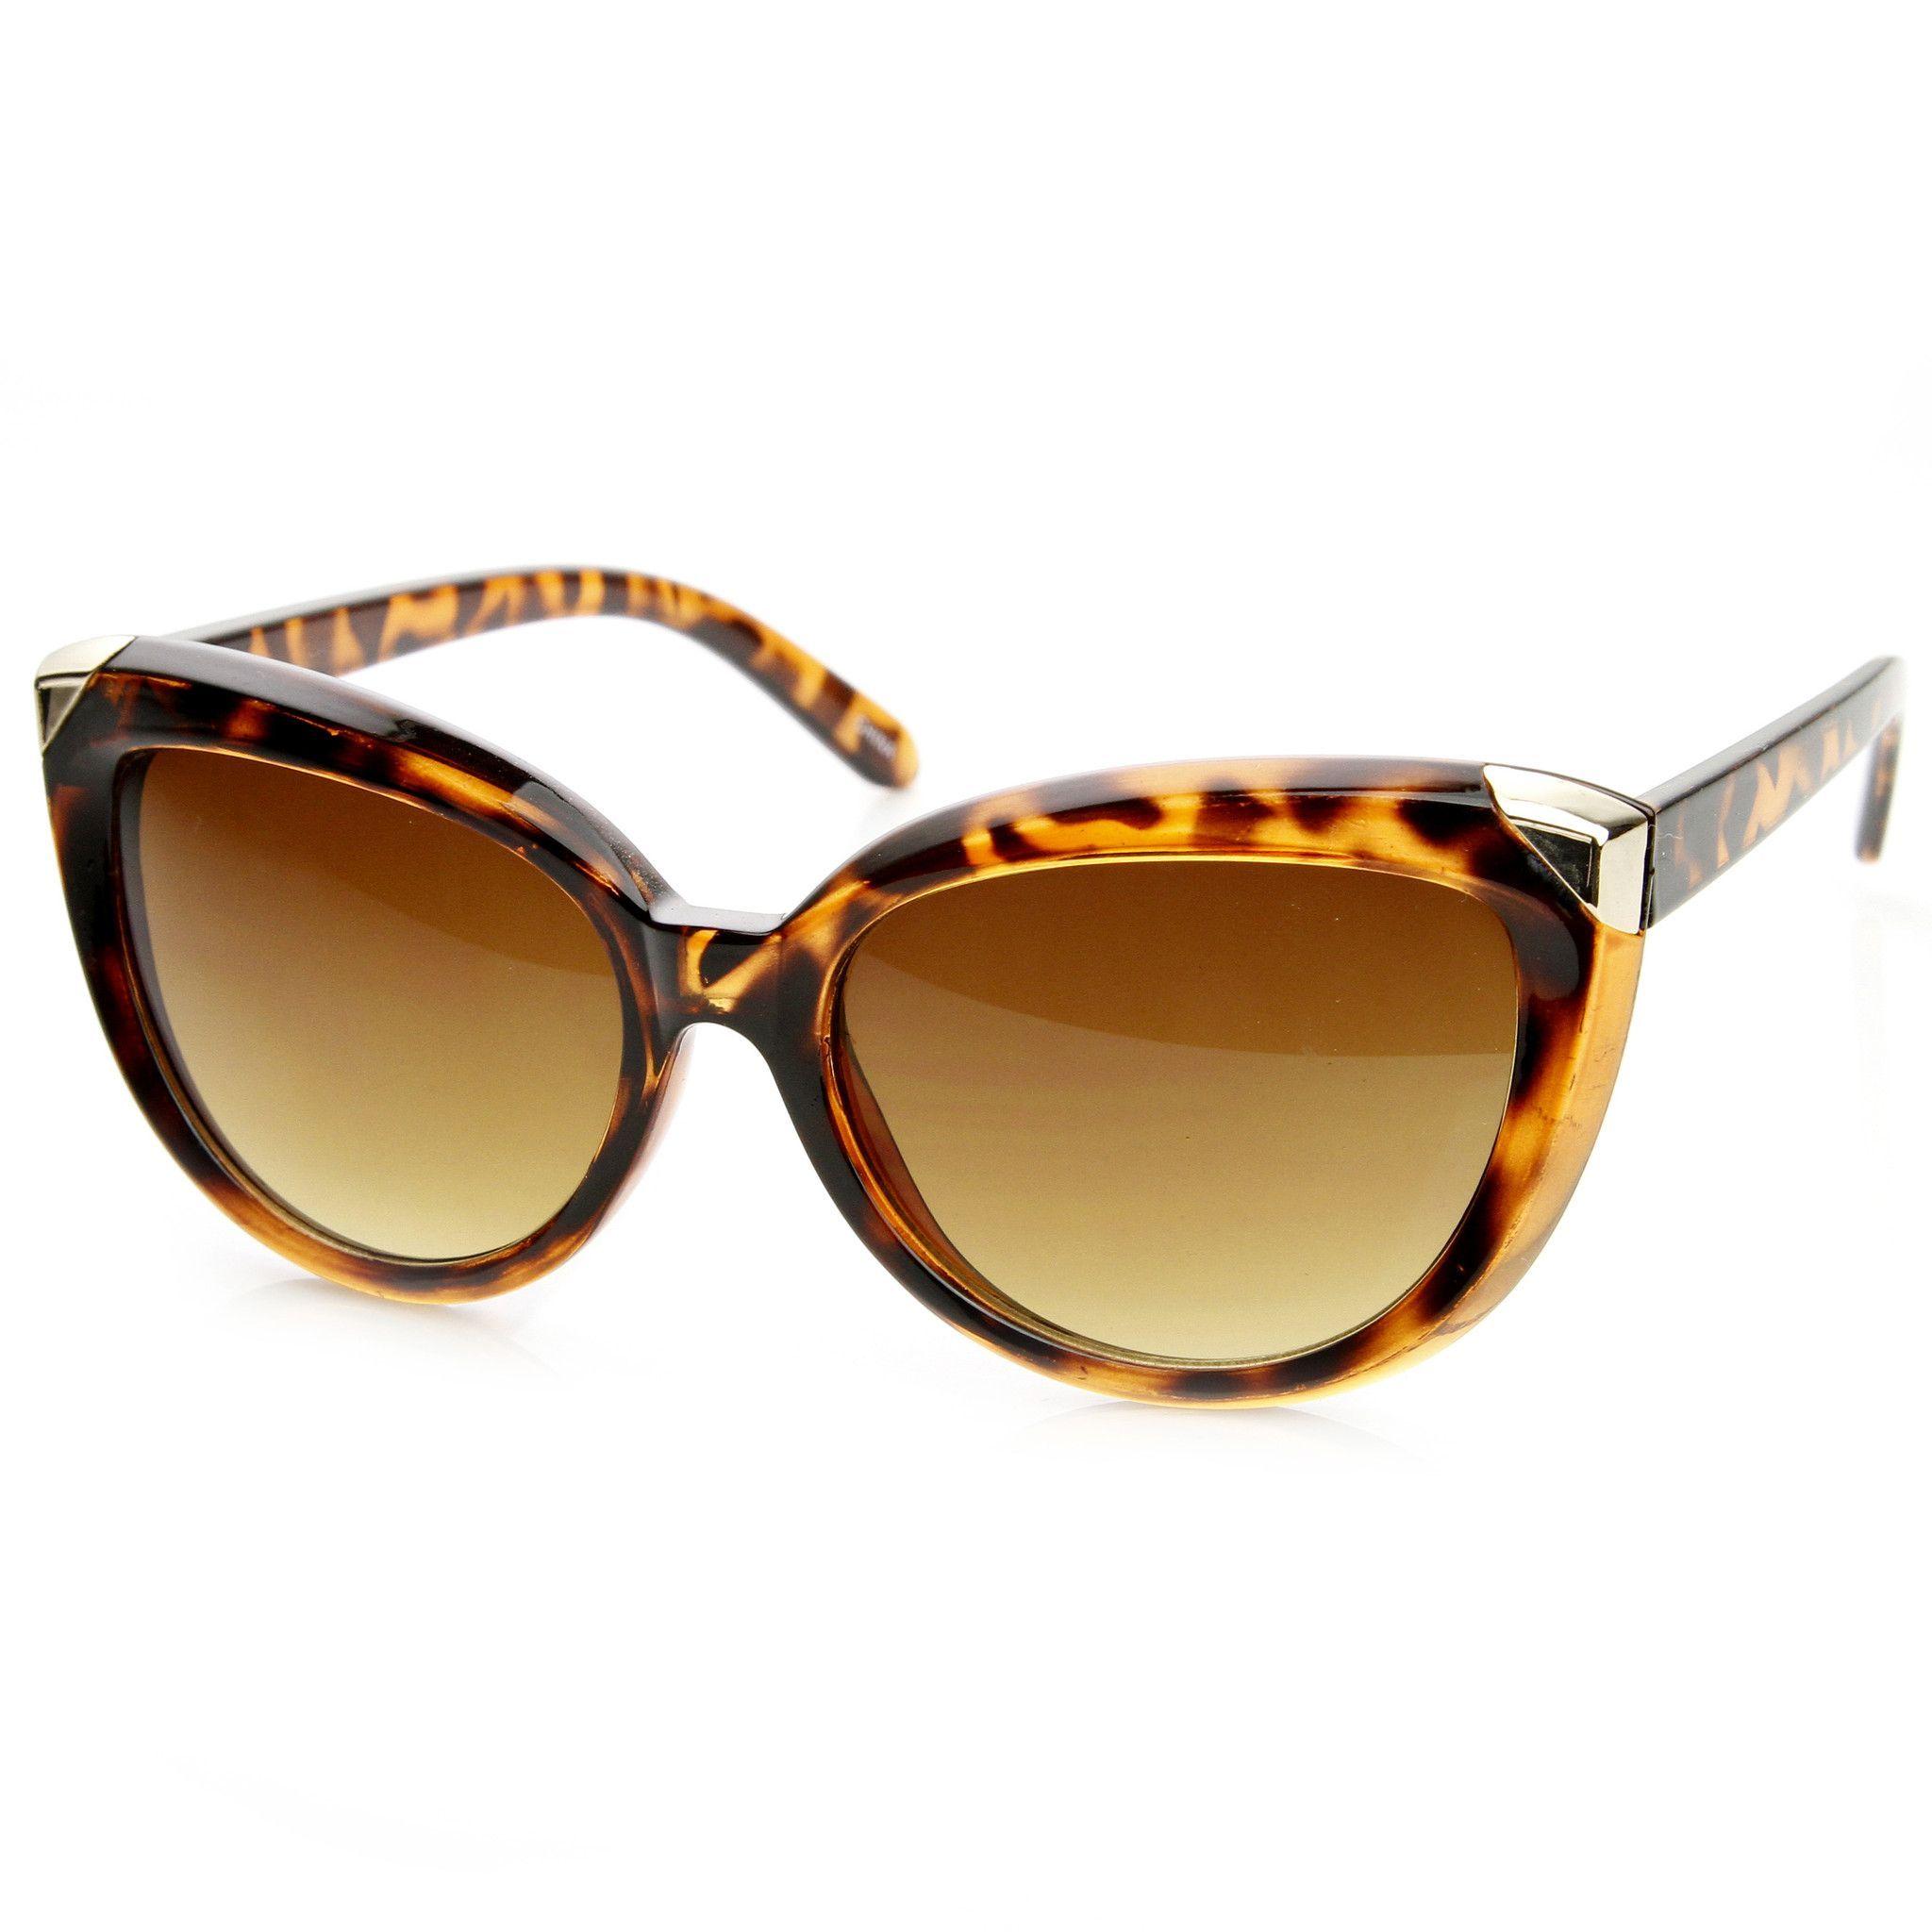 Mod Retro Oversize Bold Cat Eye Womens Fashion Sunglasses 9224 Cat Eye Sunglasses Cat Eye Sunglasses Women Fashion Sunglasses